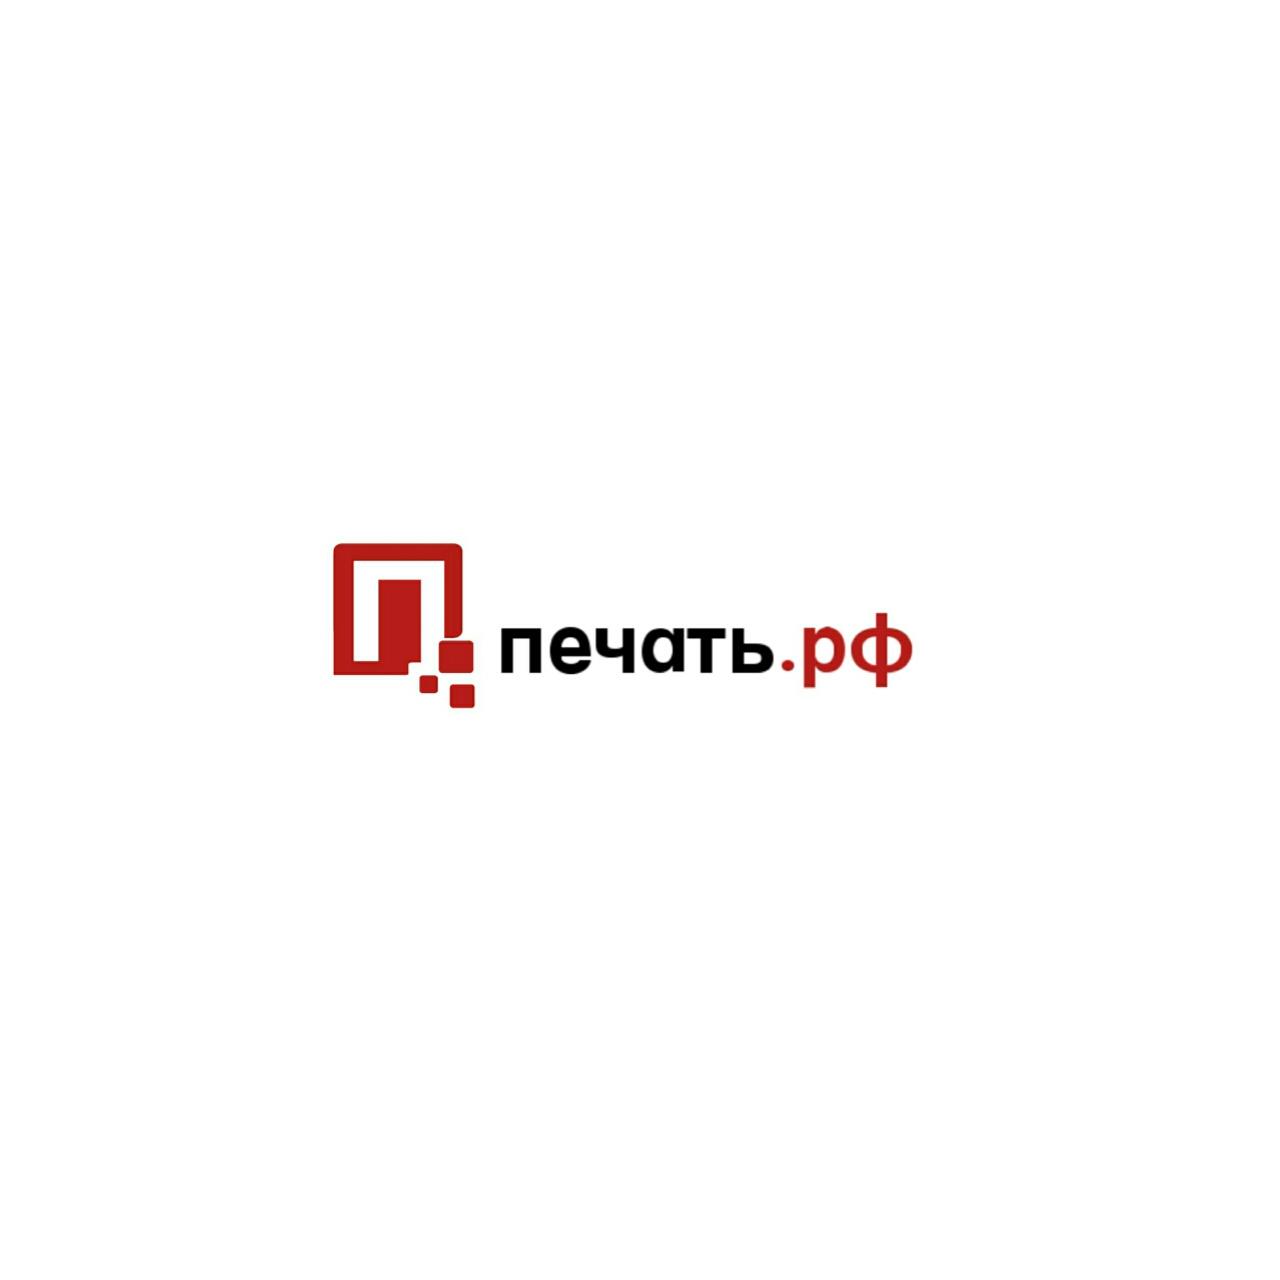 Логотип для веб-сервиса интерьерной печати и оперативной пол фото f_0035d28ce54c8577.jpg